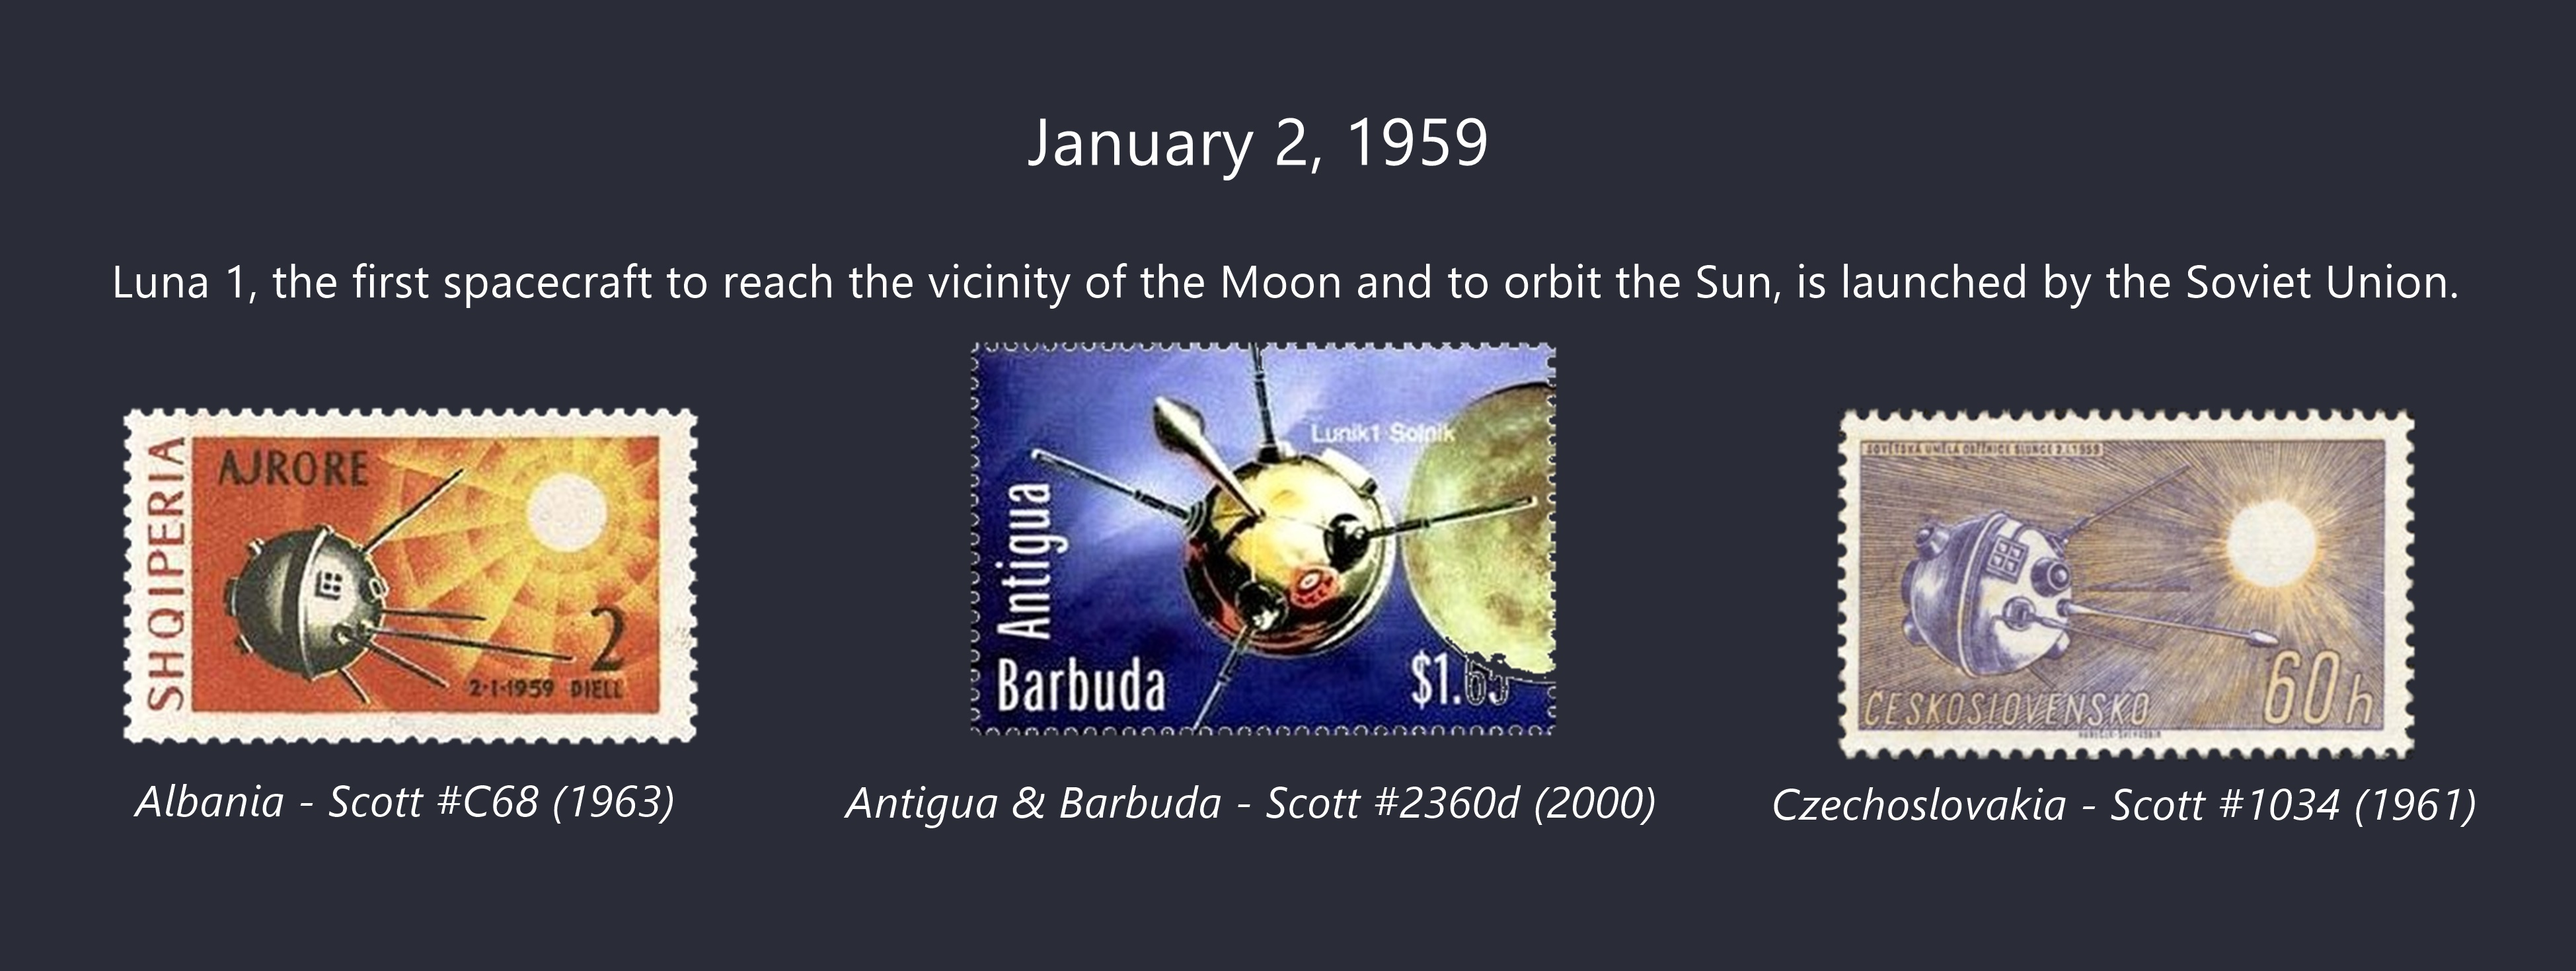 January 2, 1959